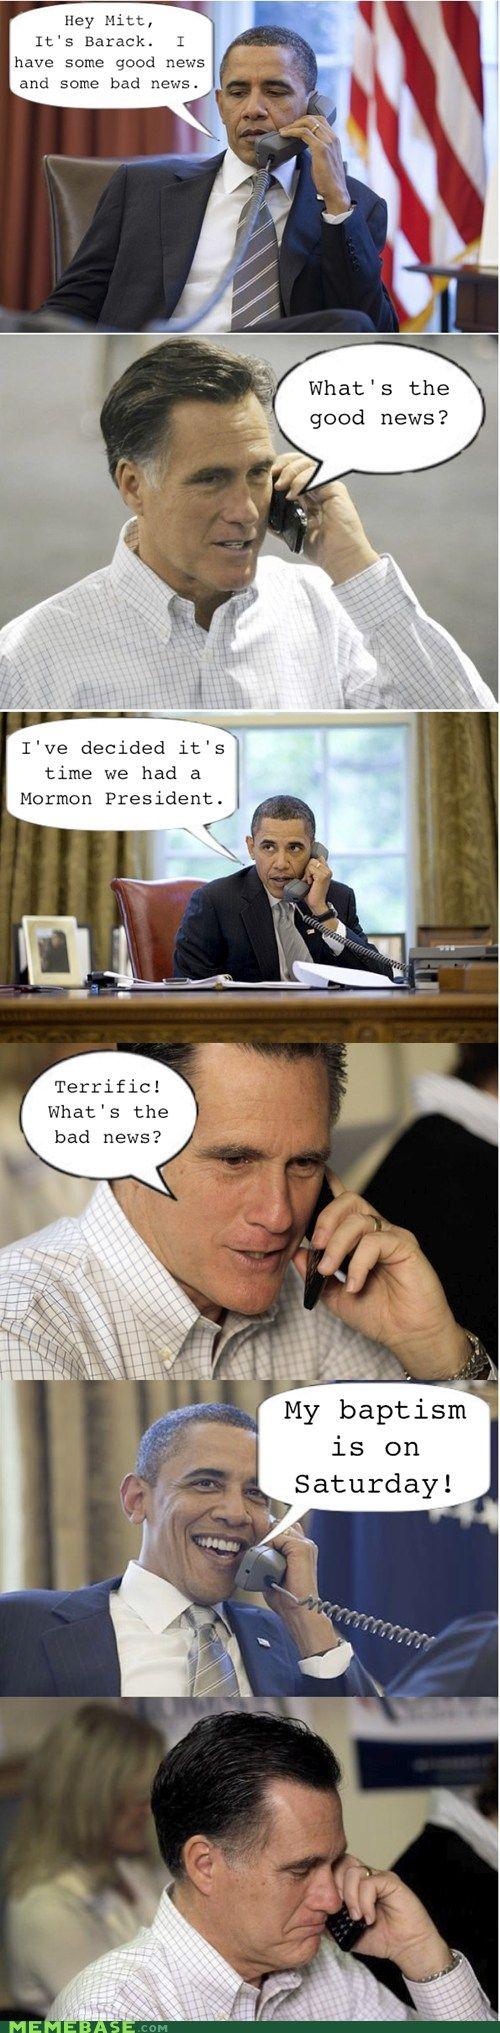 Mormon President: Mormon President, U.S. Presidents, Funny Stuff, Funnies, So Funny, Hilarious, Mormon Humor, Mormons